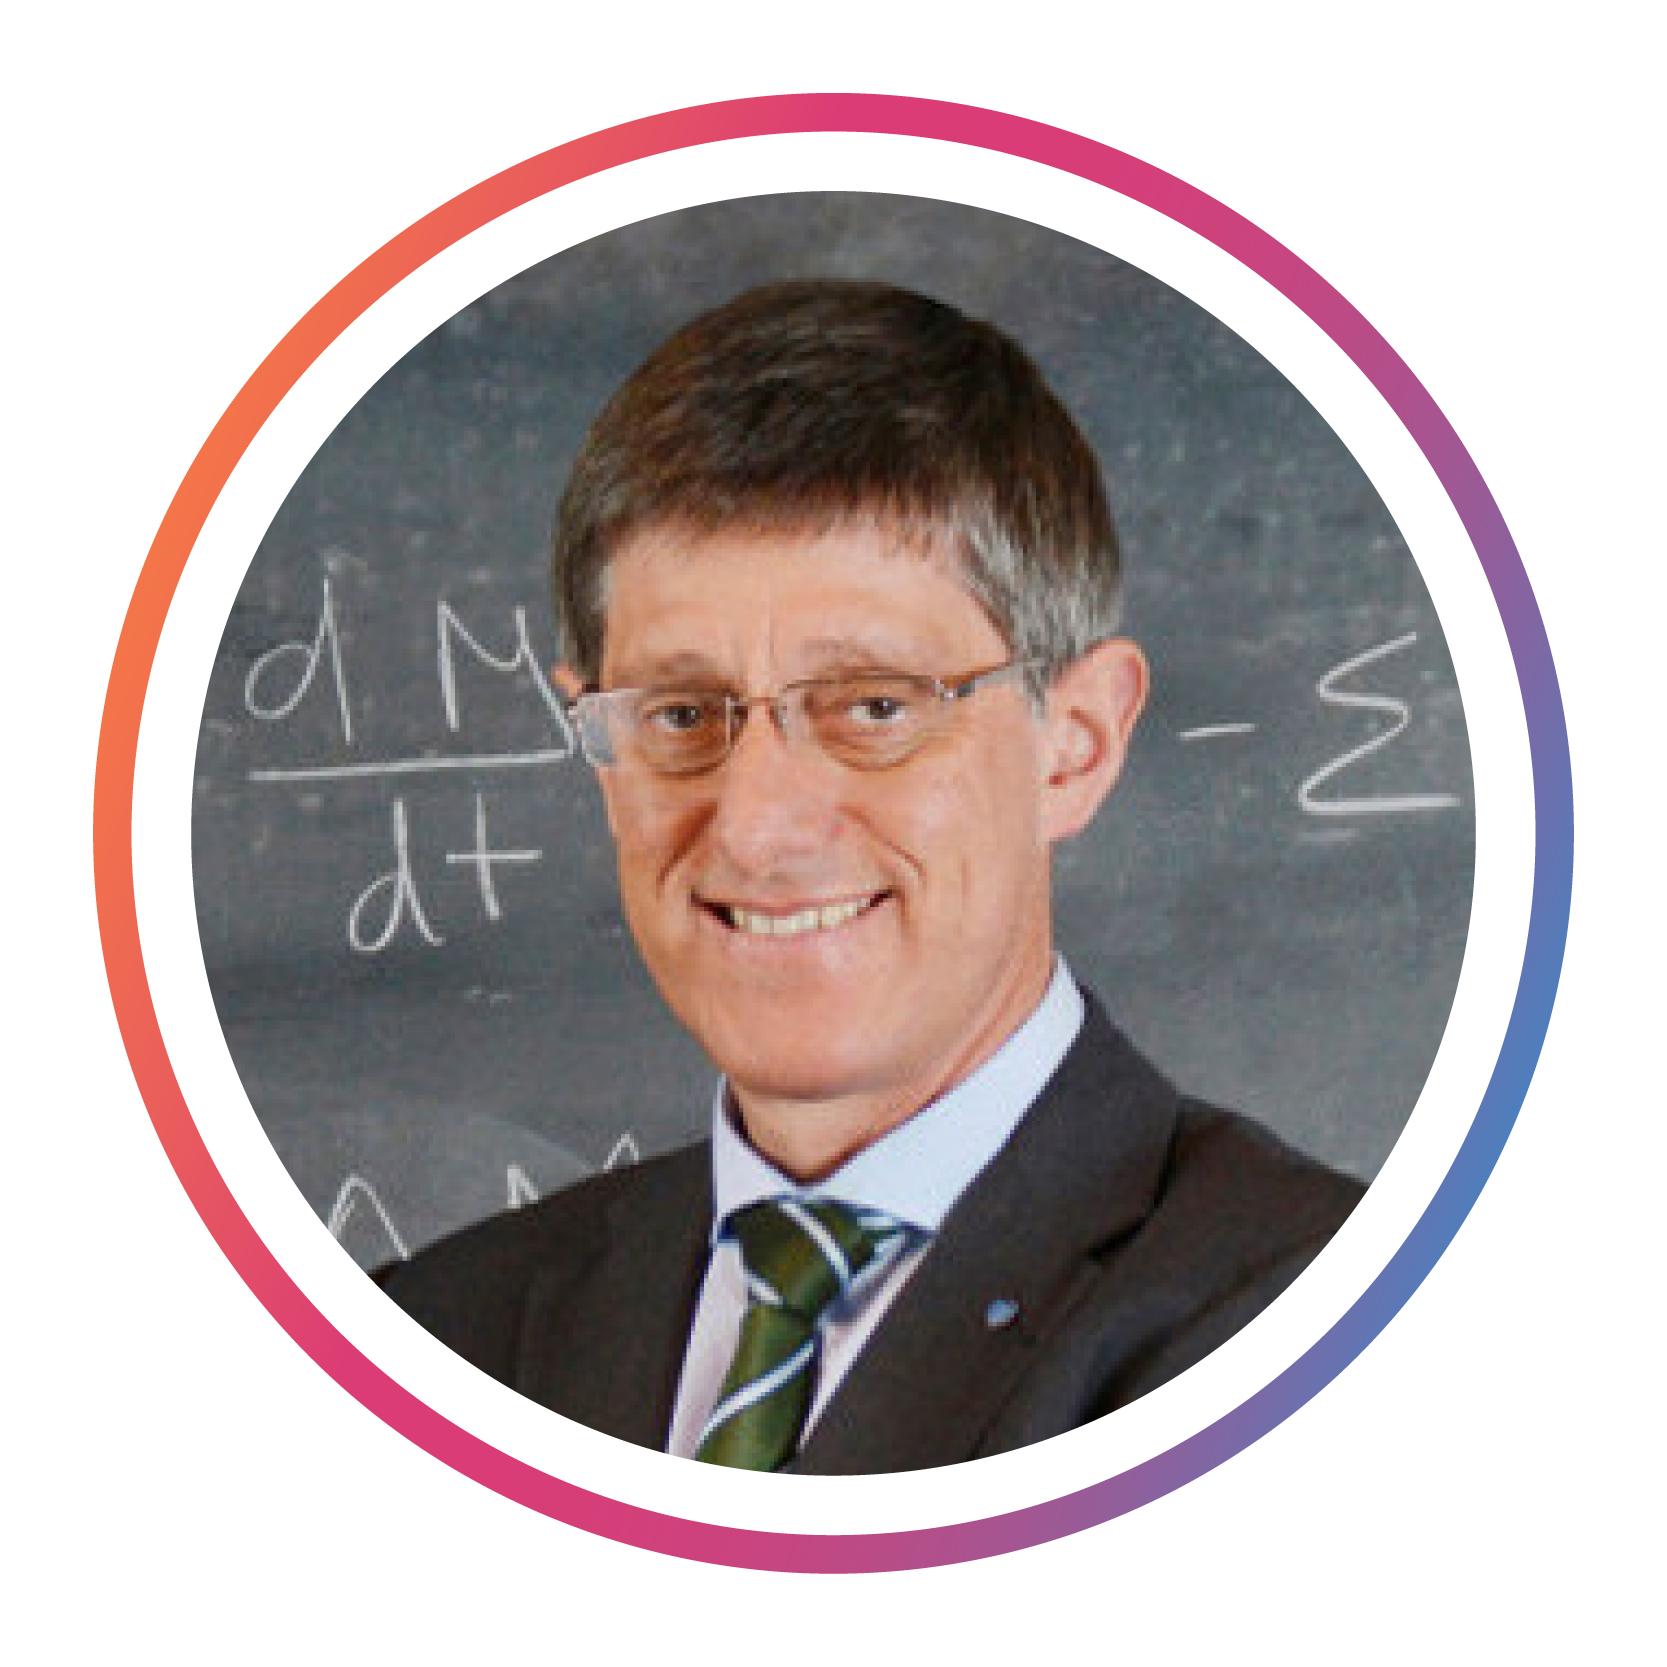 Arlindo Oliveira Artificial Intelligence Expert